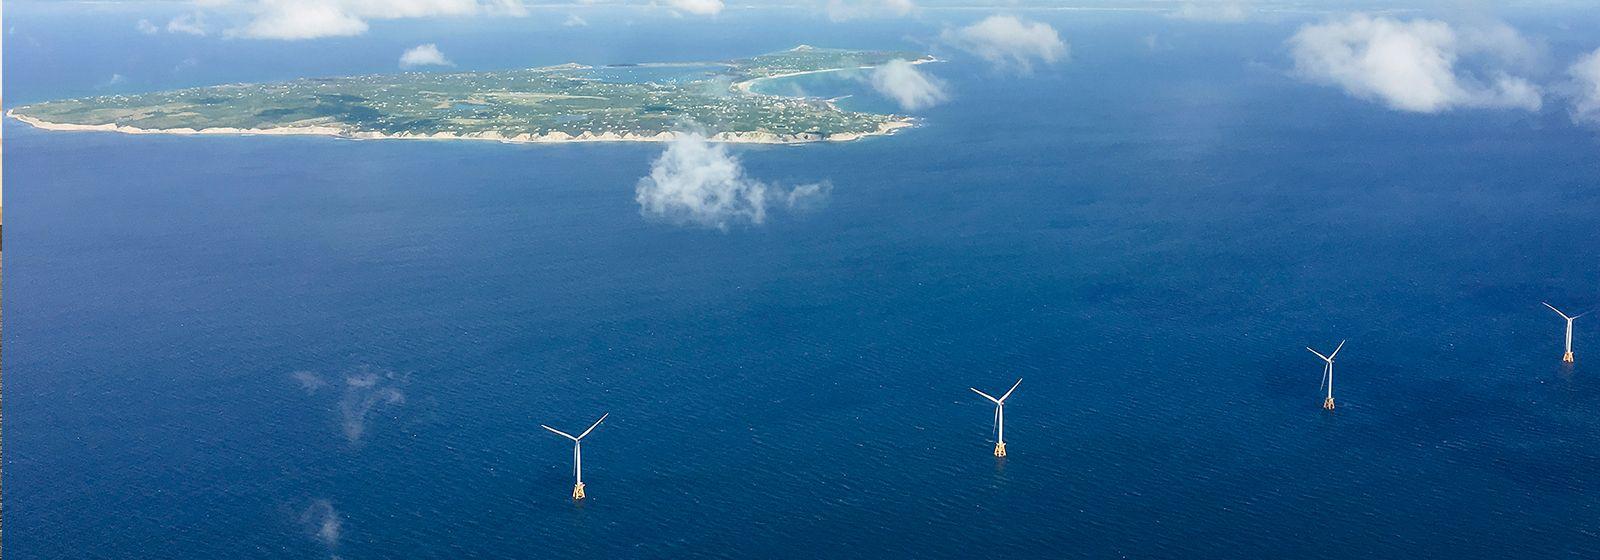 Block Island wind farm now spinning